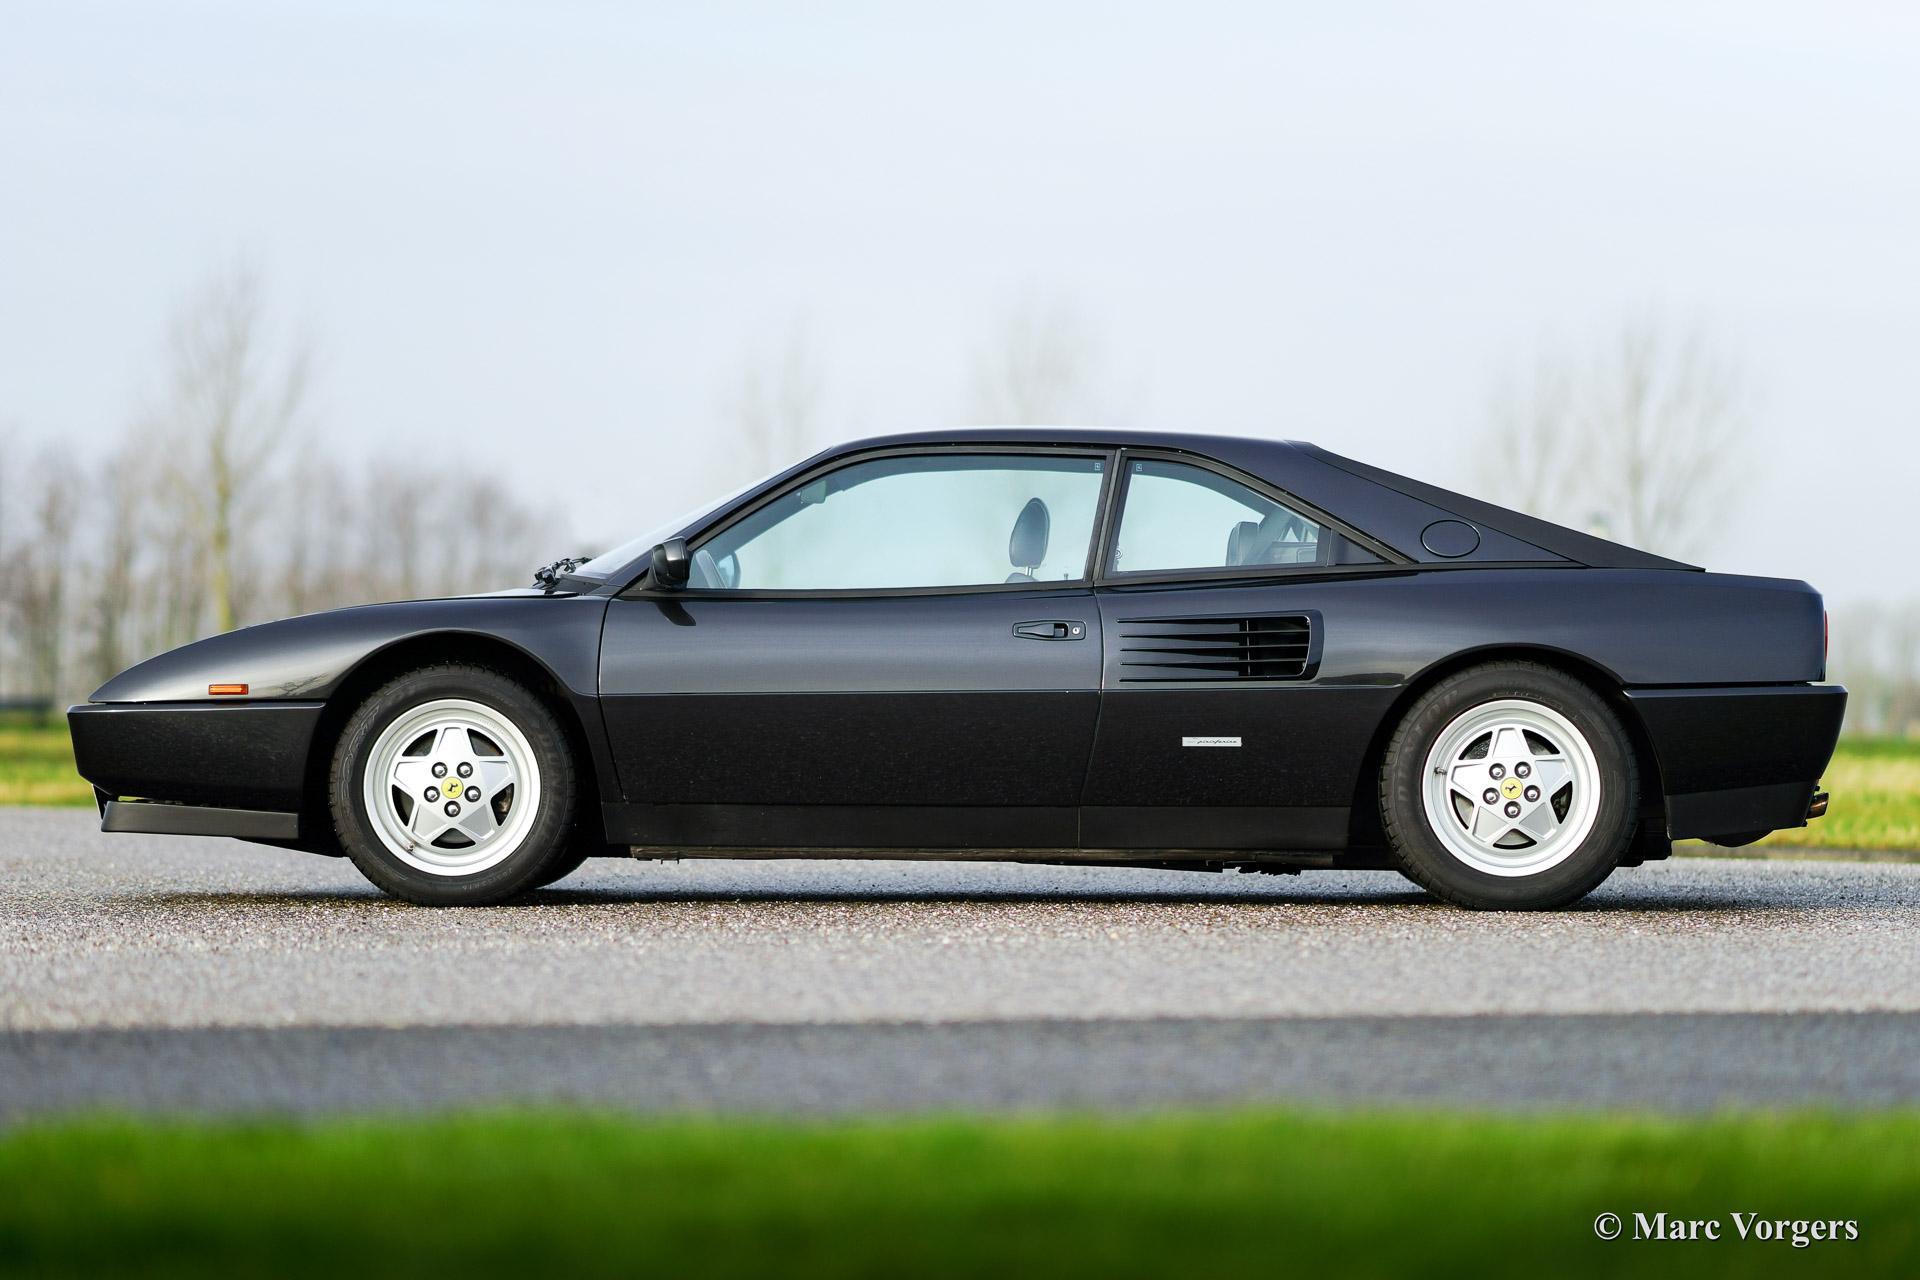 ferrari-mondial-001 Elegant Ferrari F 108 Al-mondial 8 Cars Trend